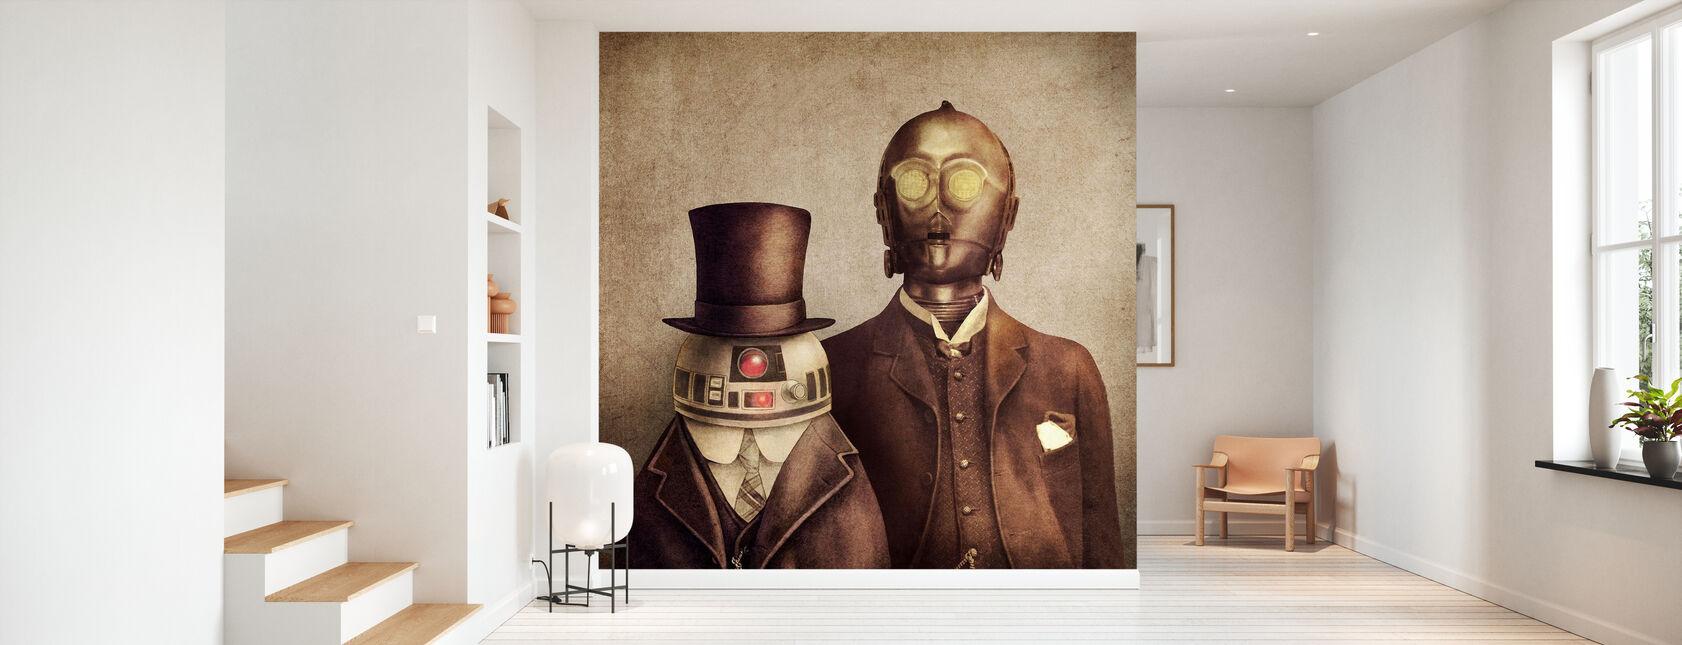 Victorian Robots - Wallpaper - Hallway